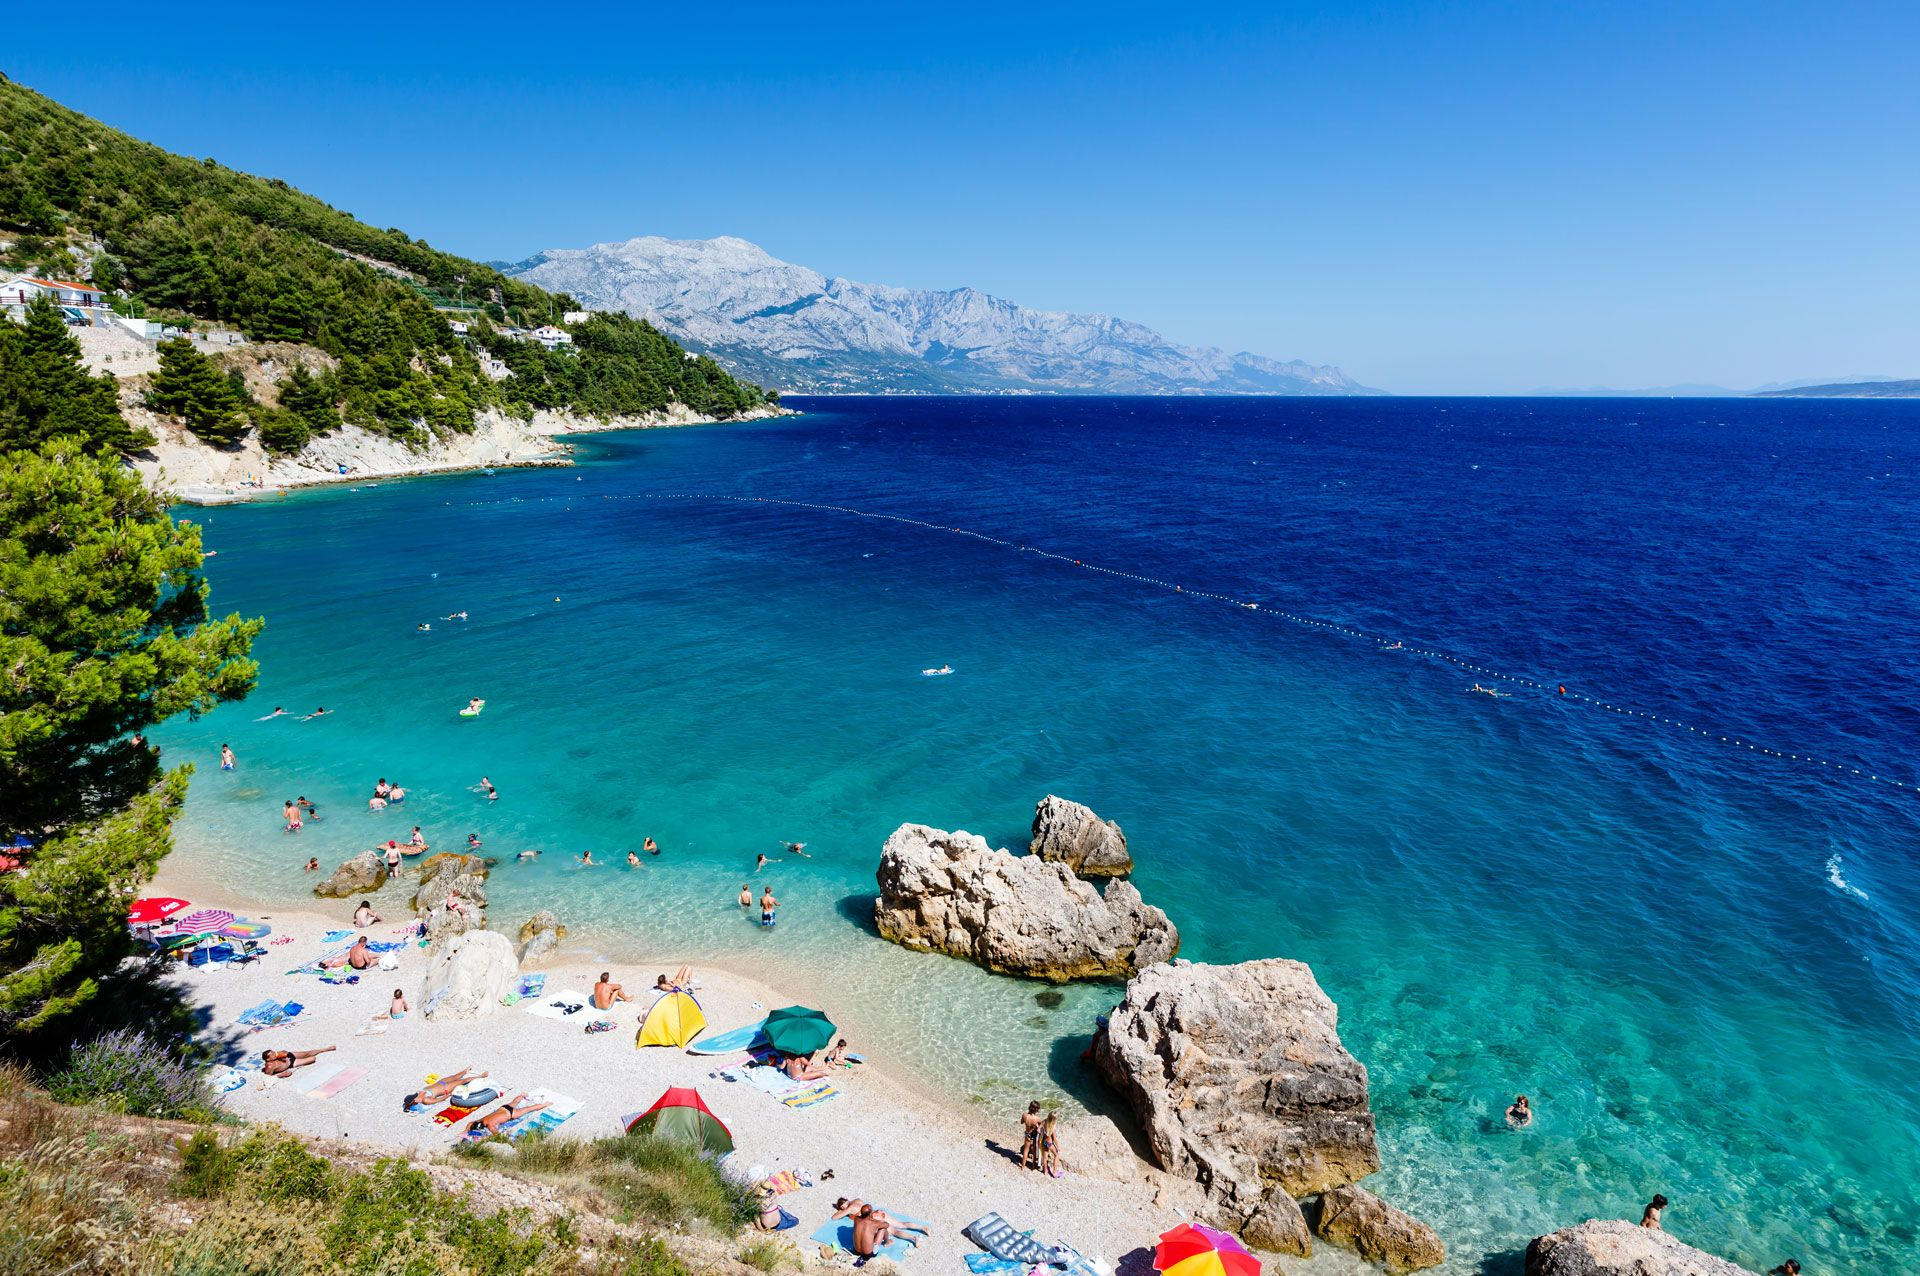 Croatia's dramatic Dalmatian Coast is home to thousands of